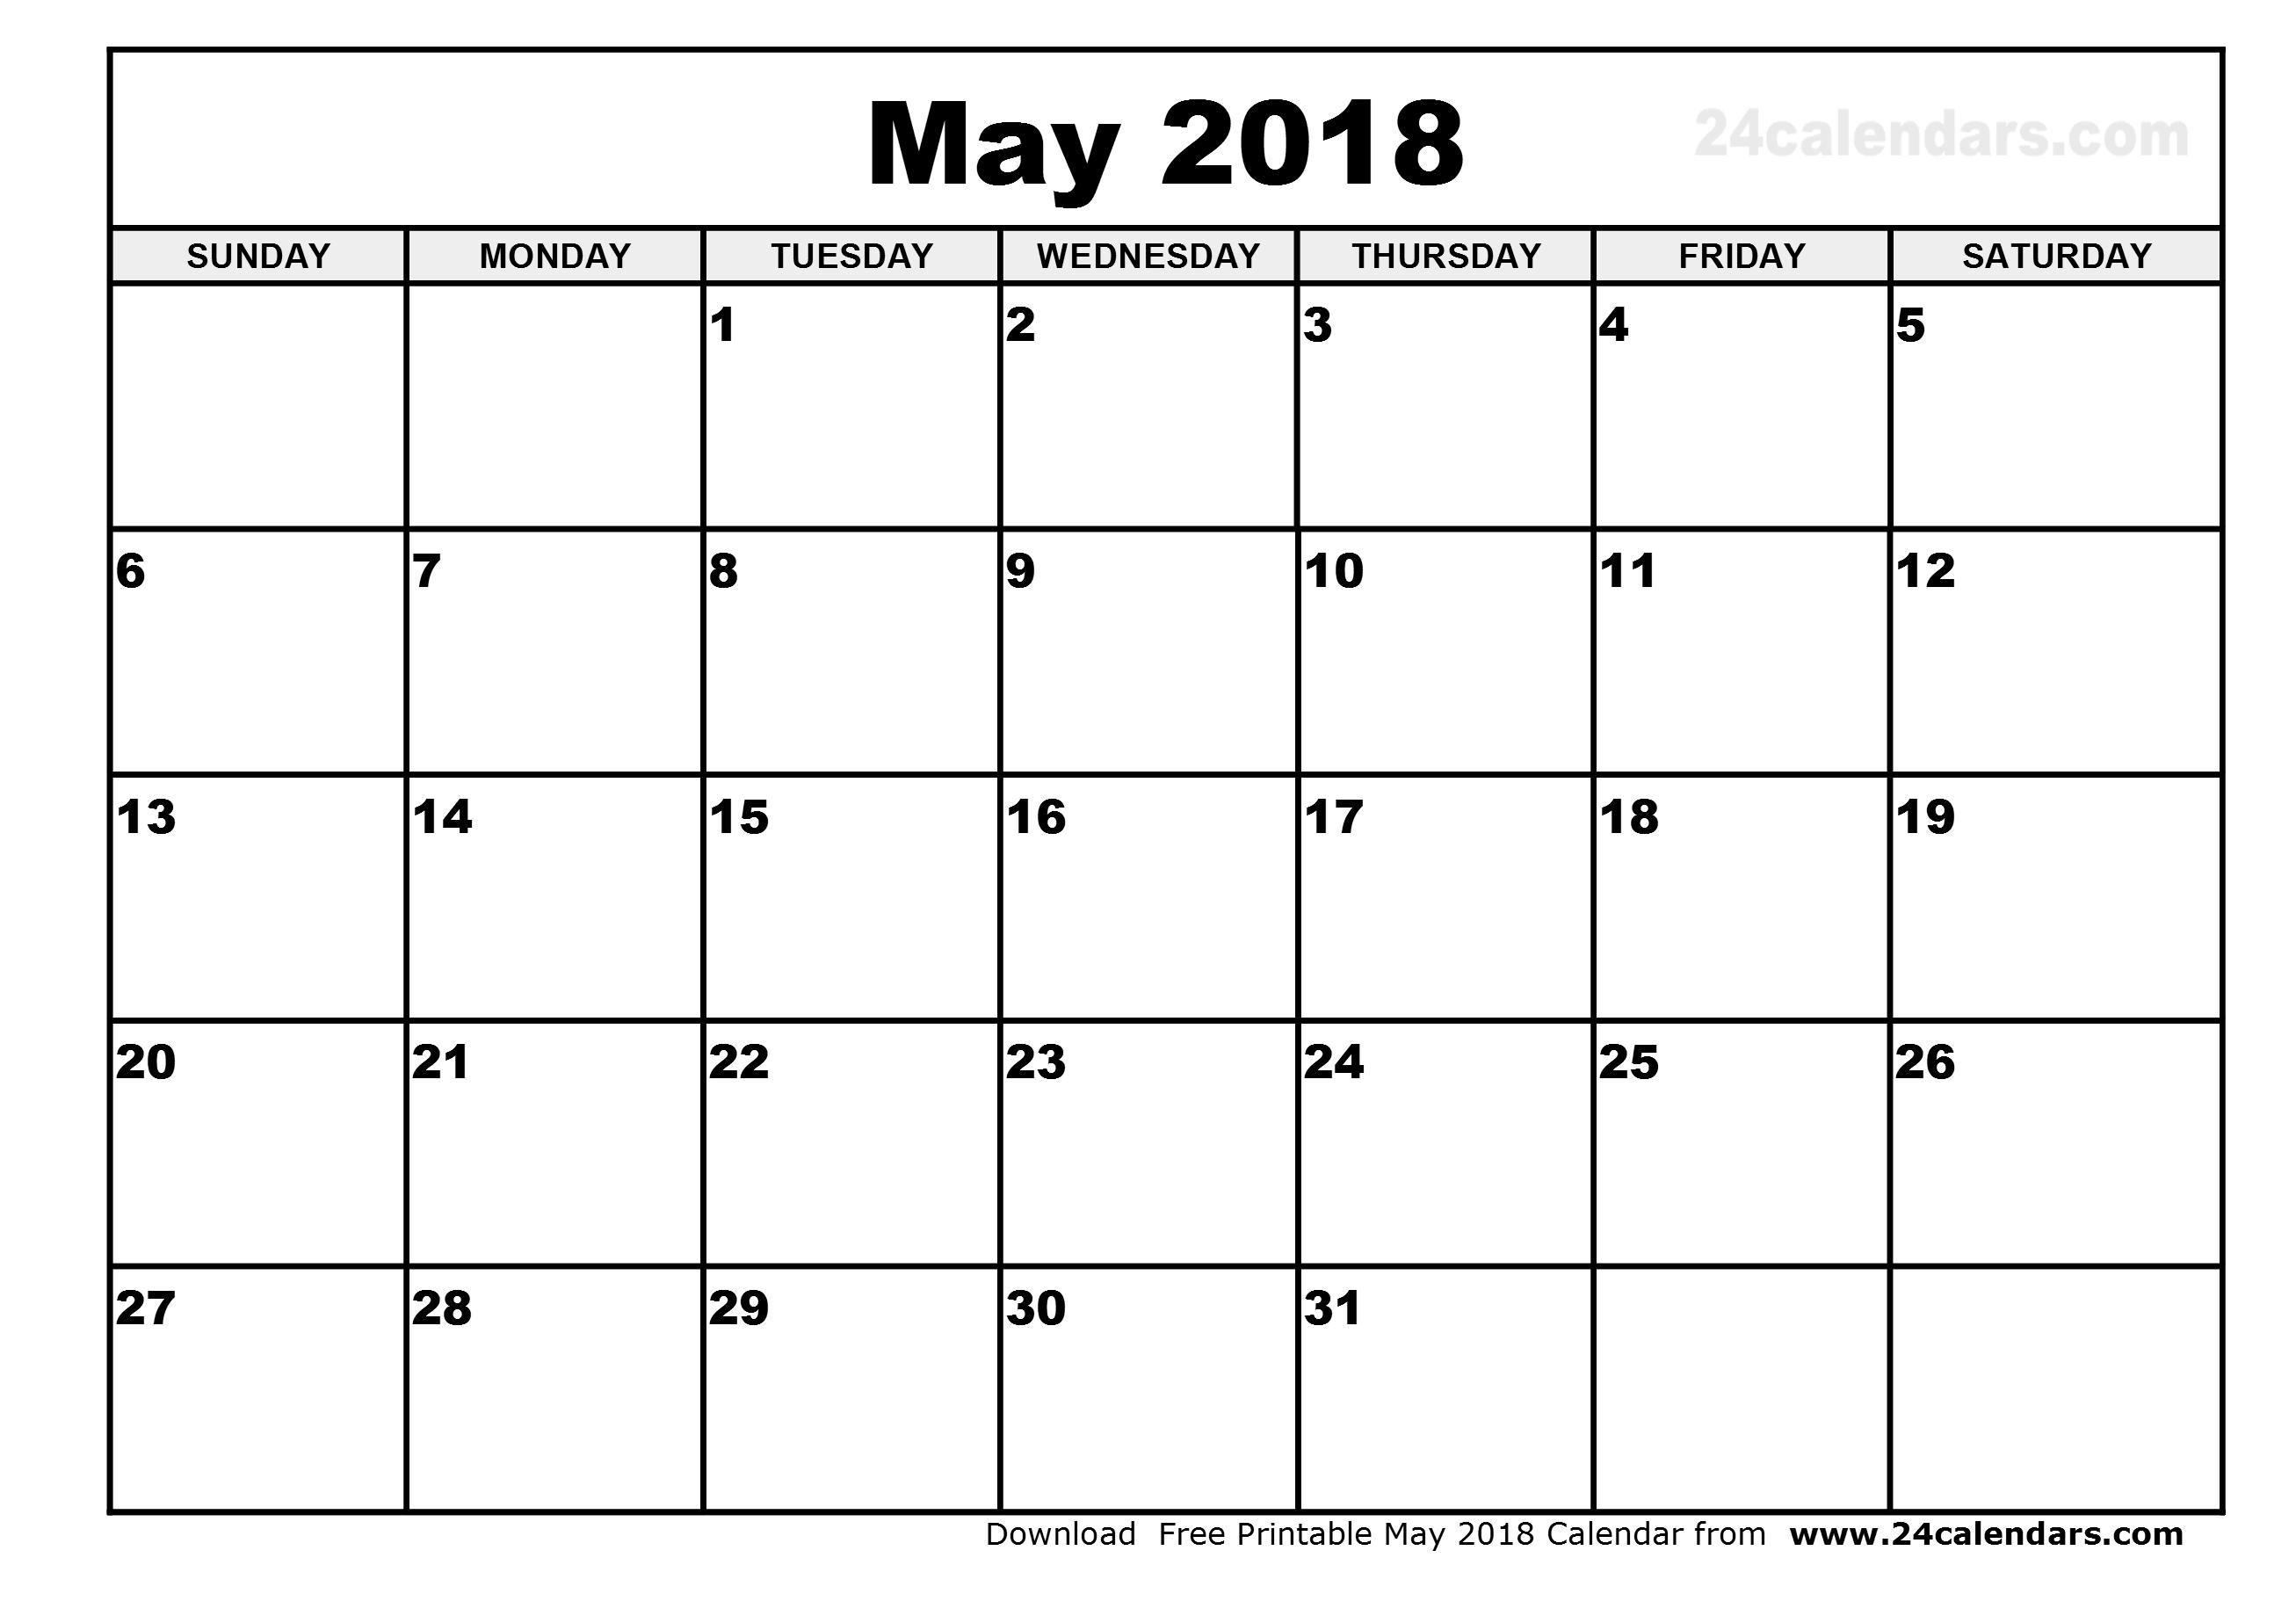 may 2018 blank calendar Ideal.vistalist.co